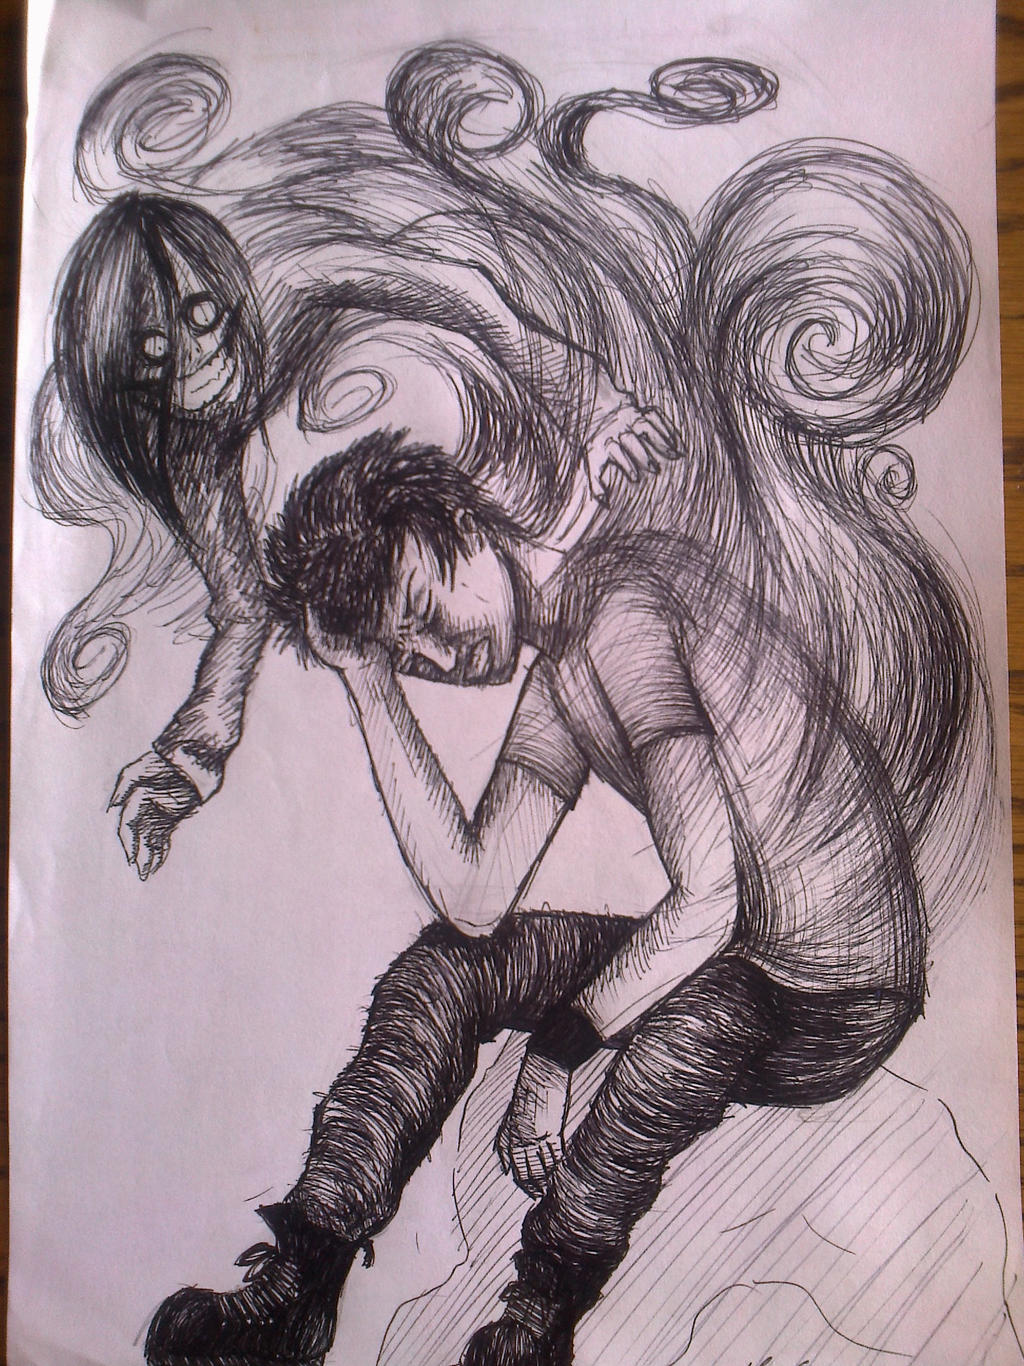 Monster inside me by Bawaria Monster inside me by Bawaria